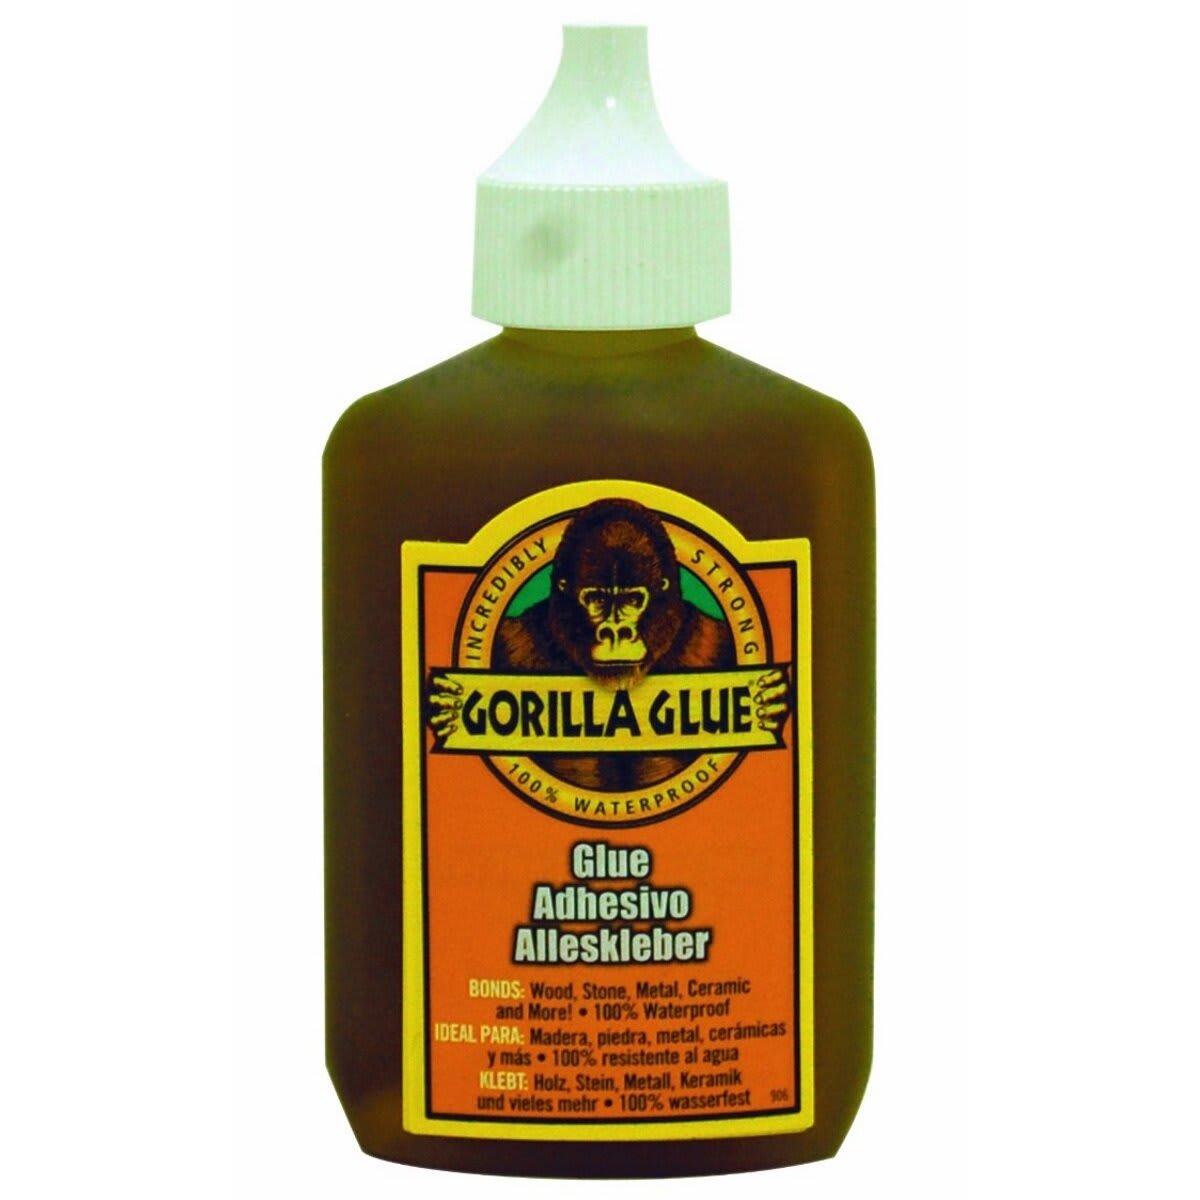 Gorilla Glue 59ml